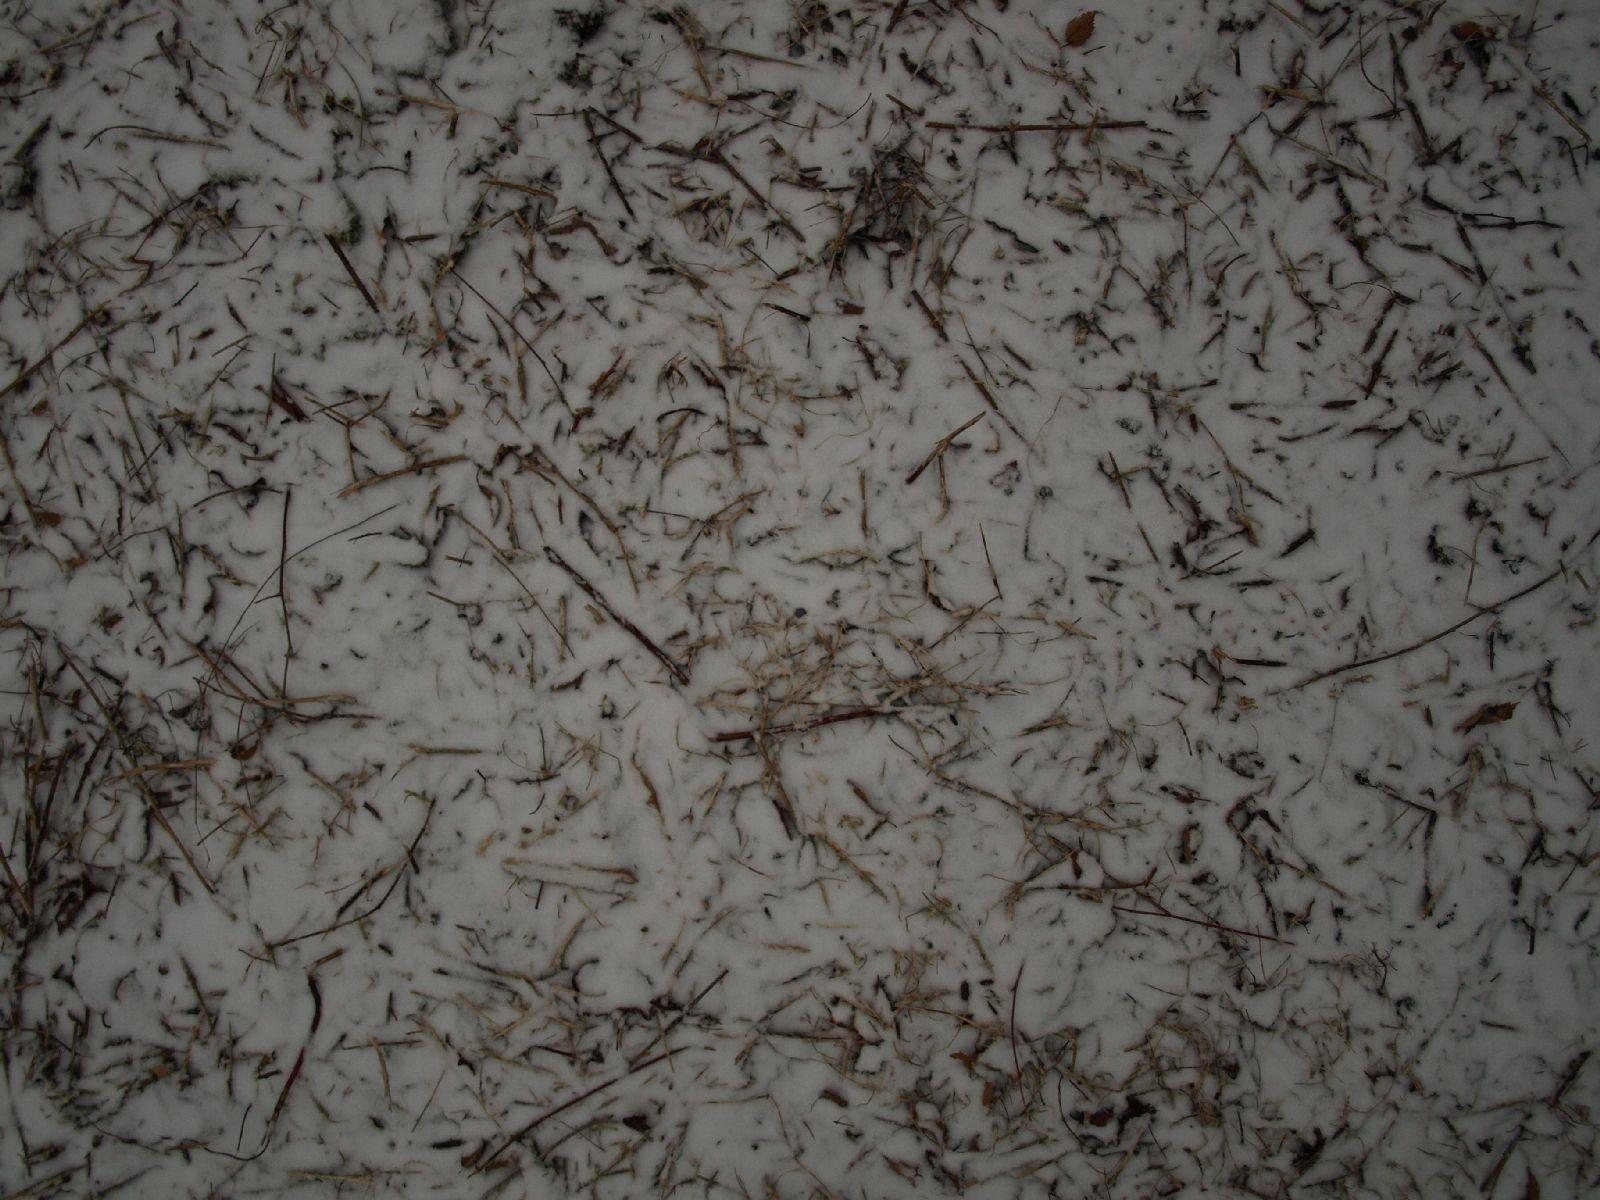 Snow_Texture_A_P1028736